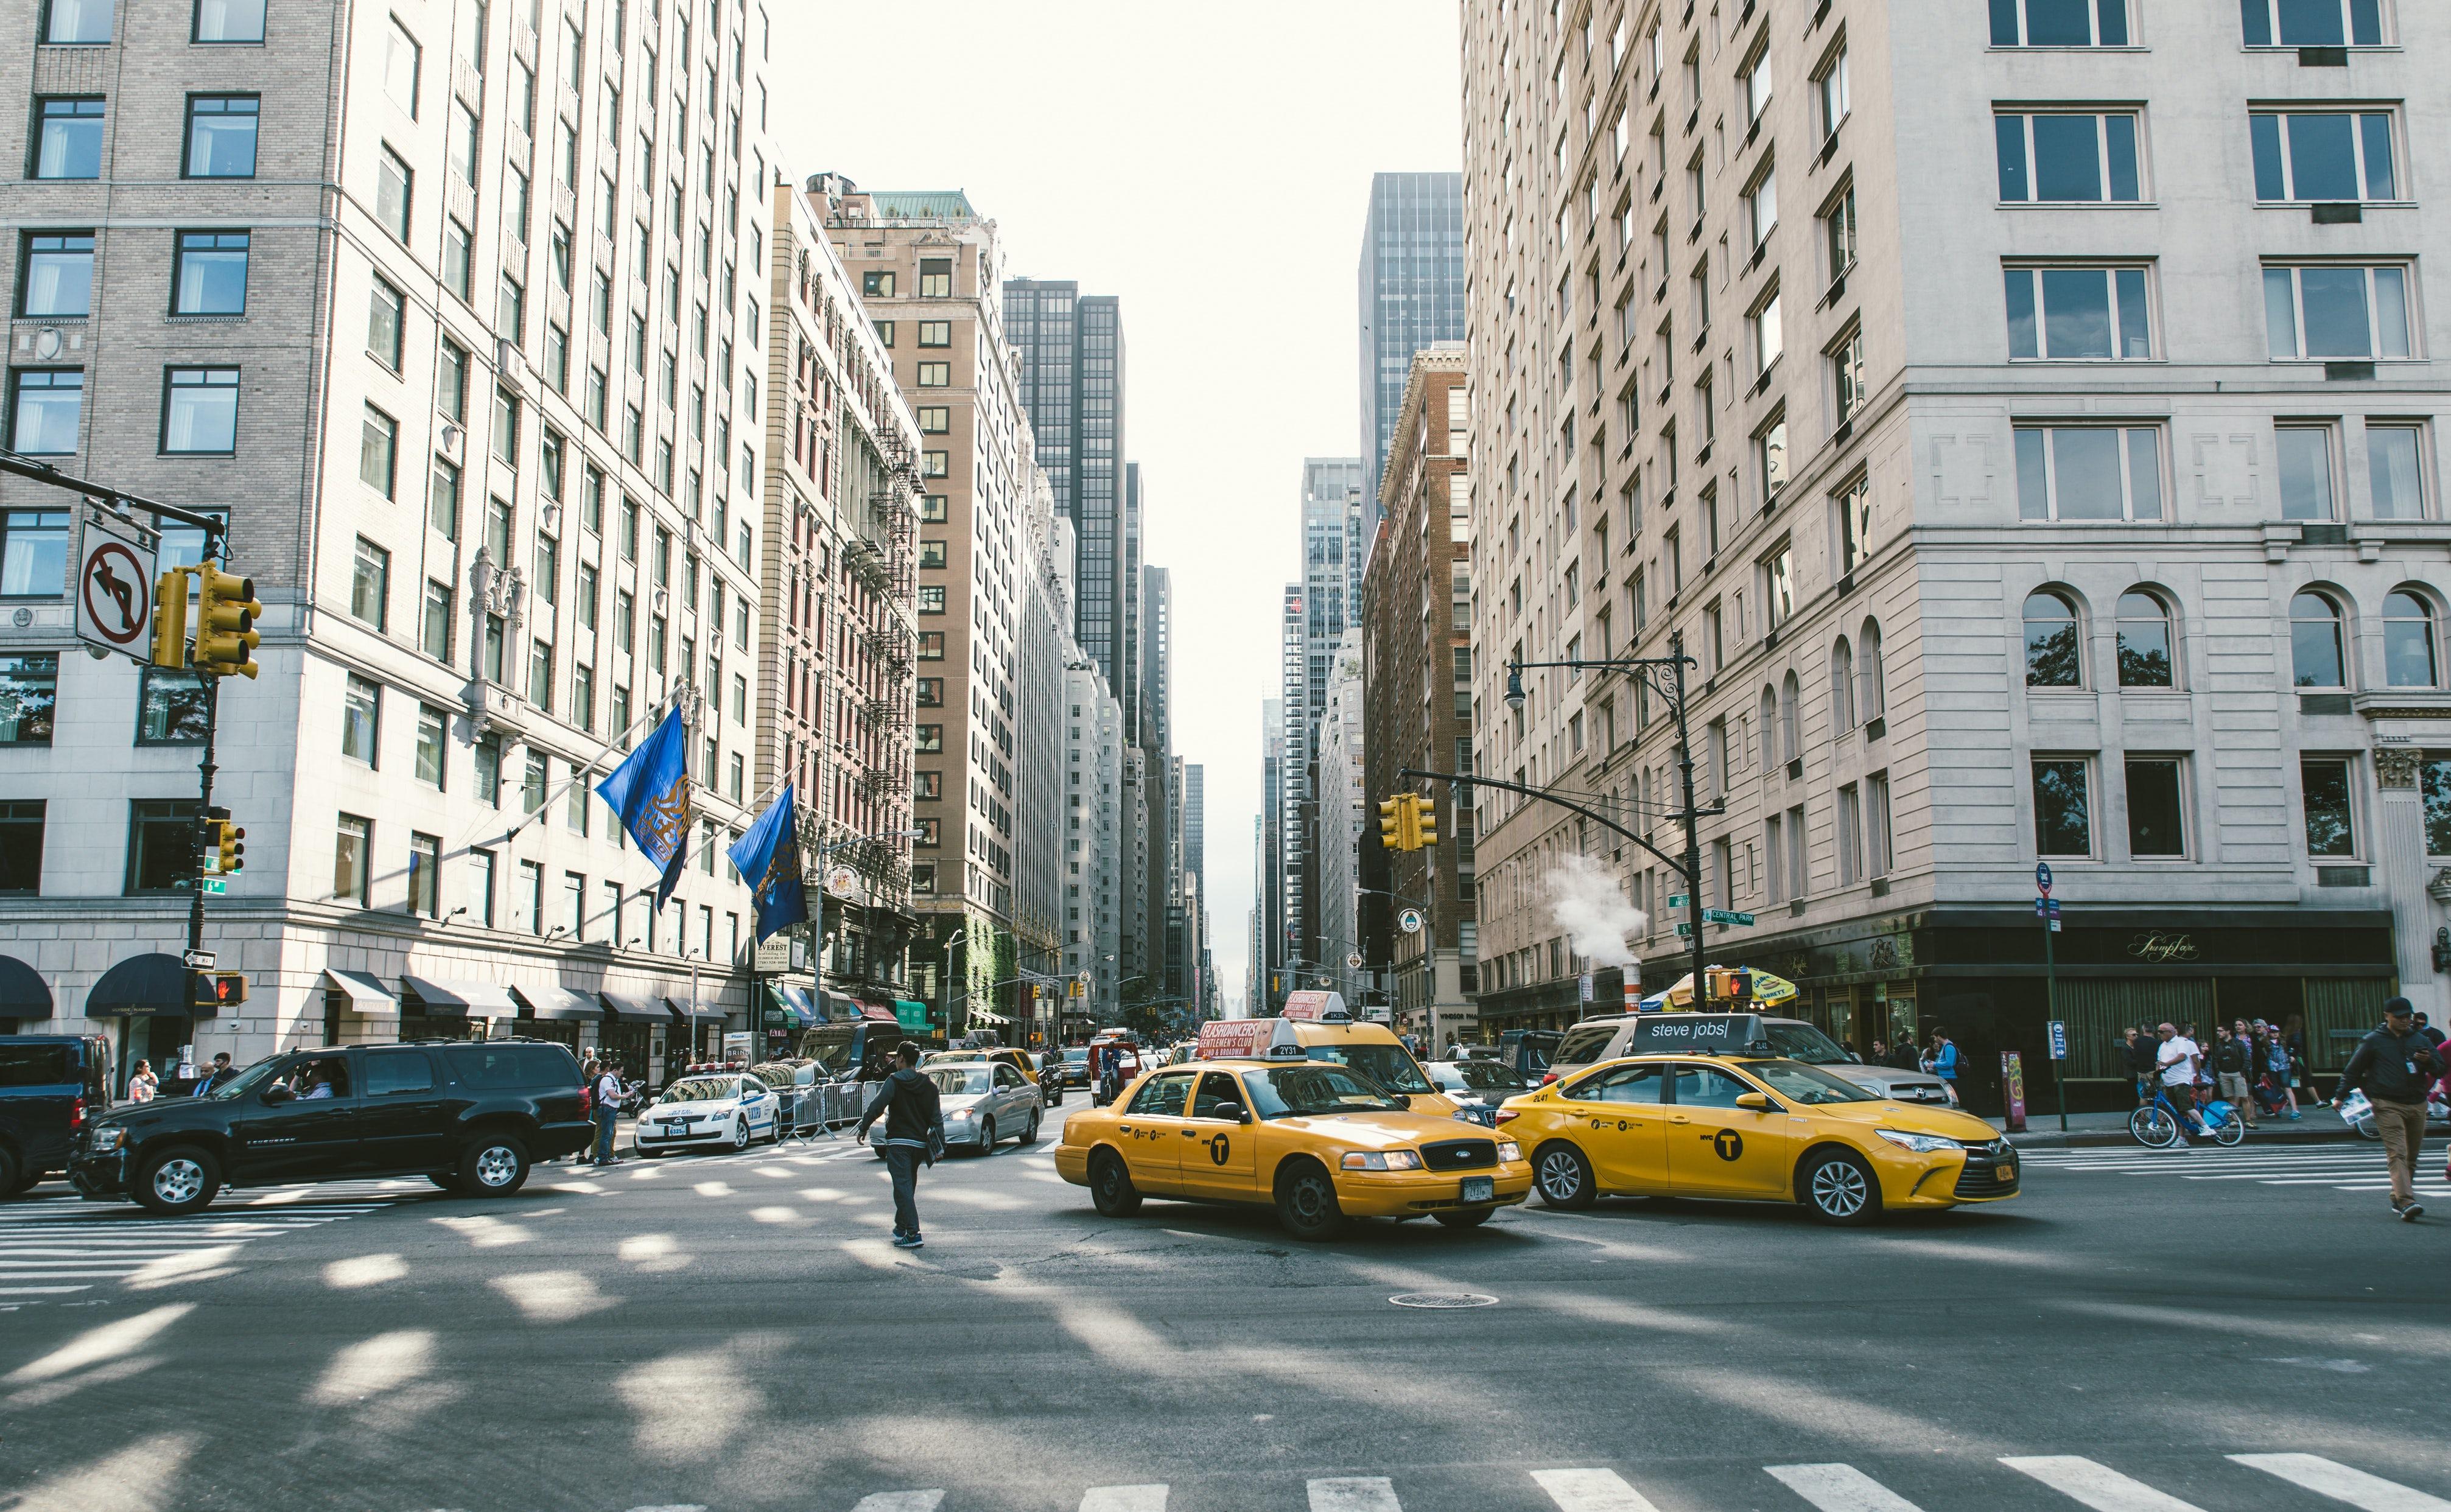 Fifth Avenue, Manhattan, New York | Source: Shutterstock